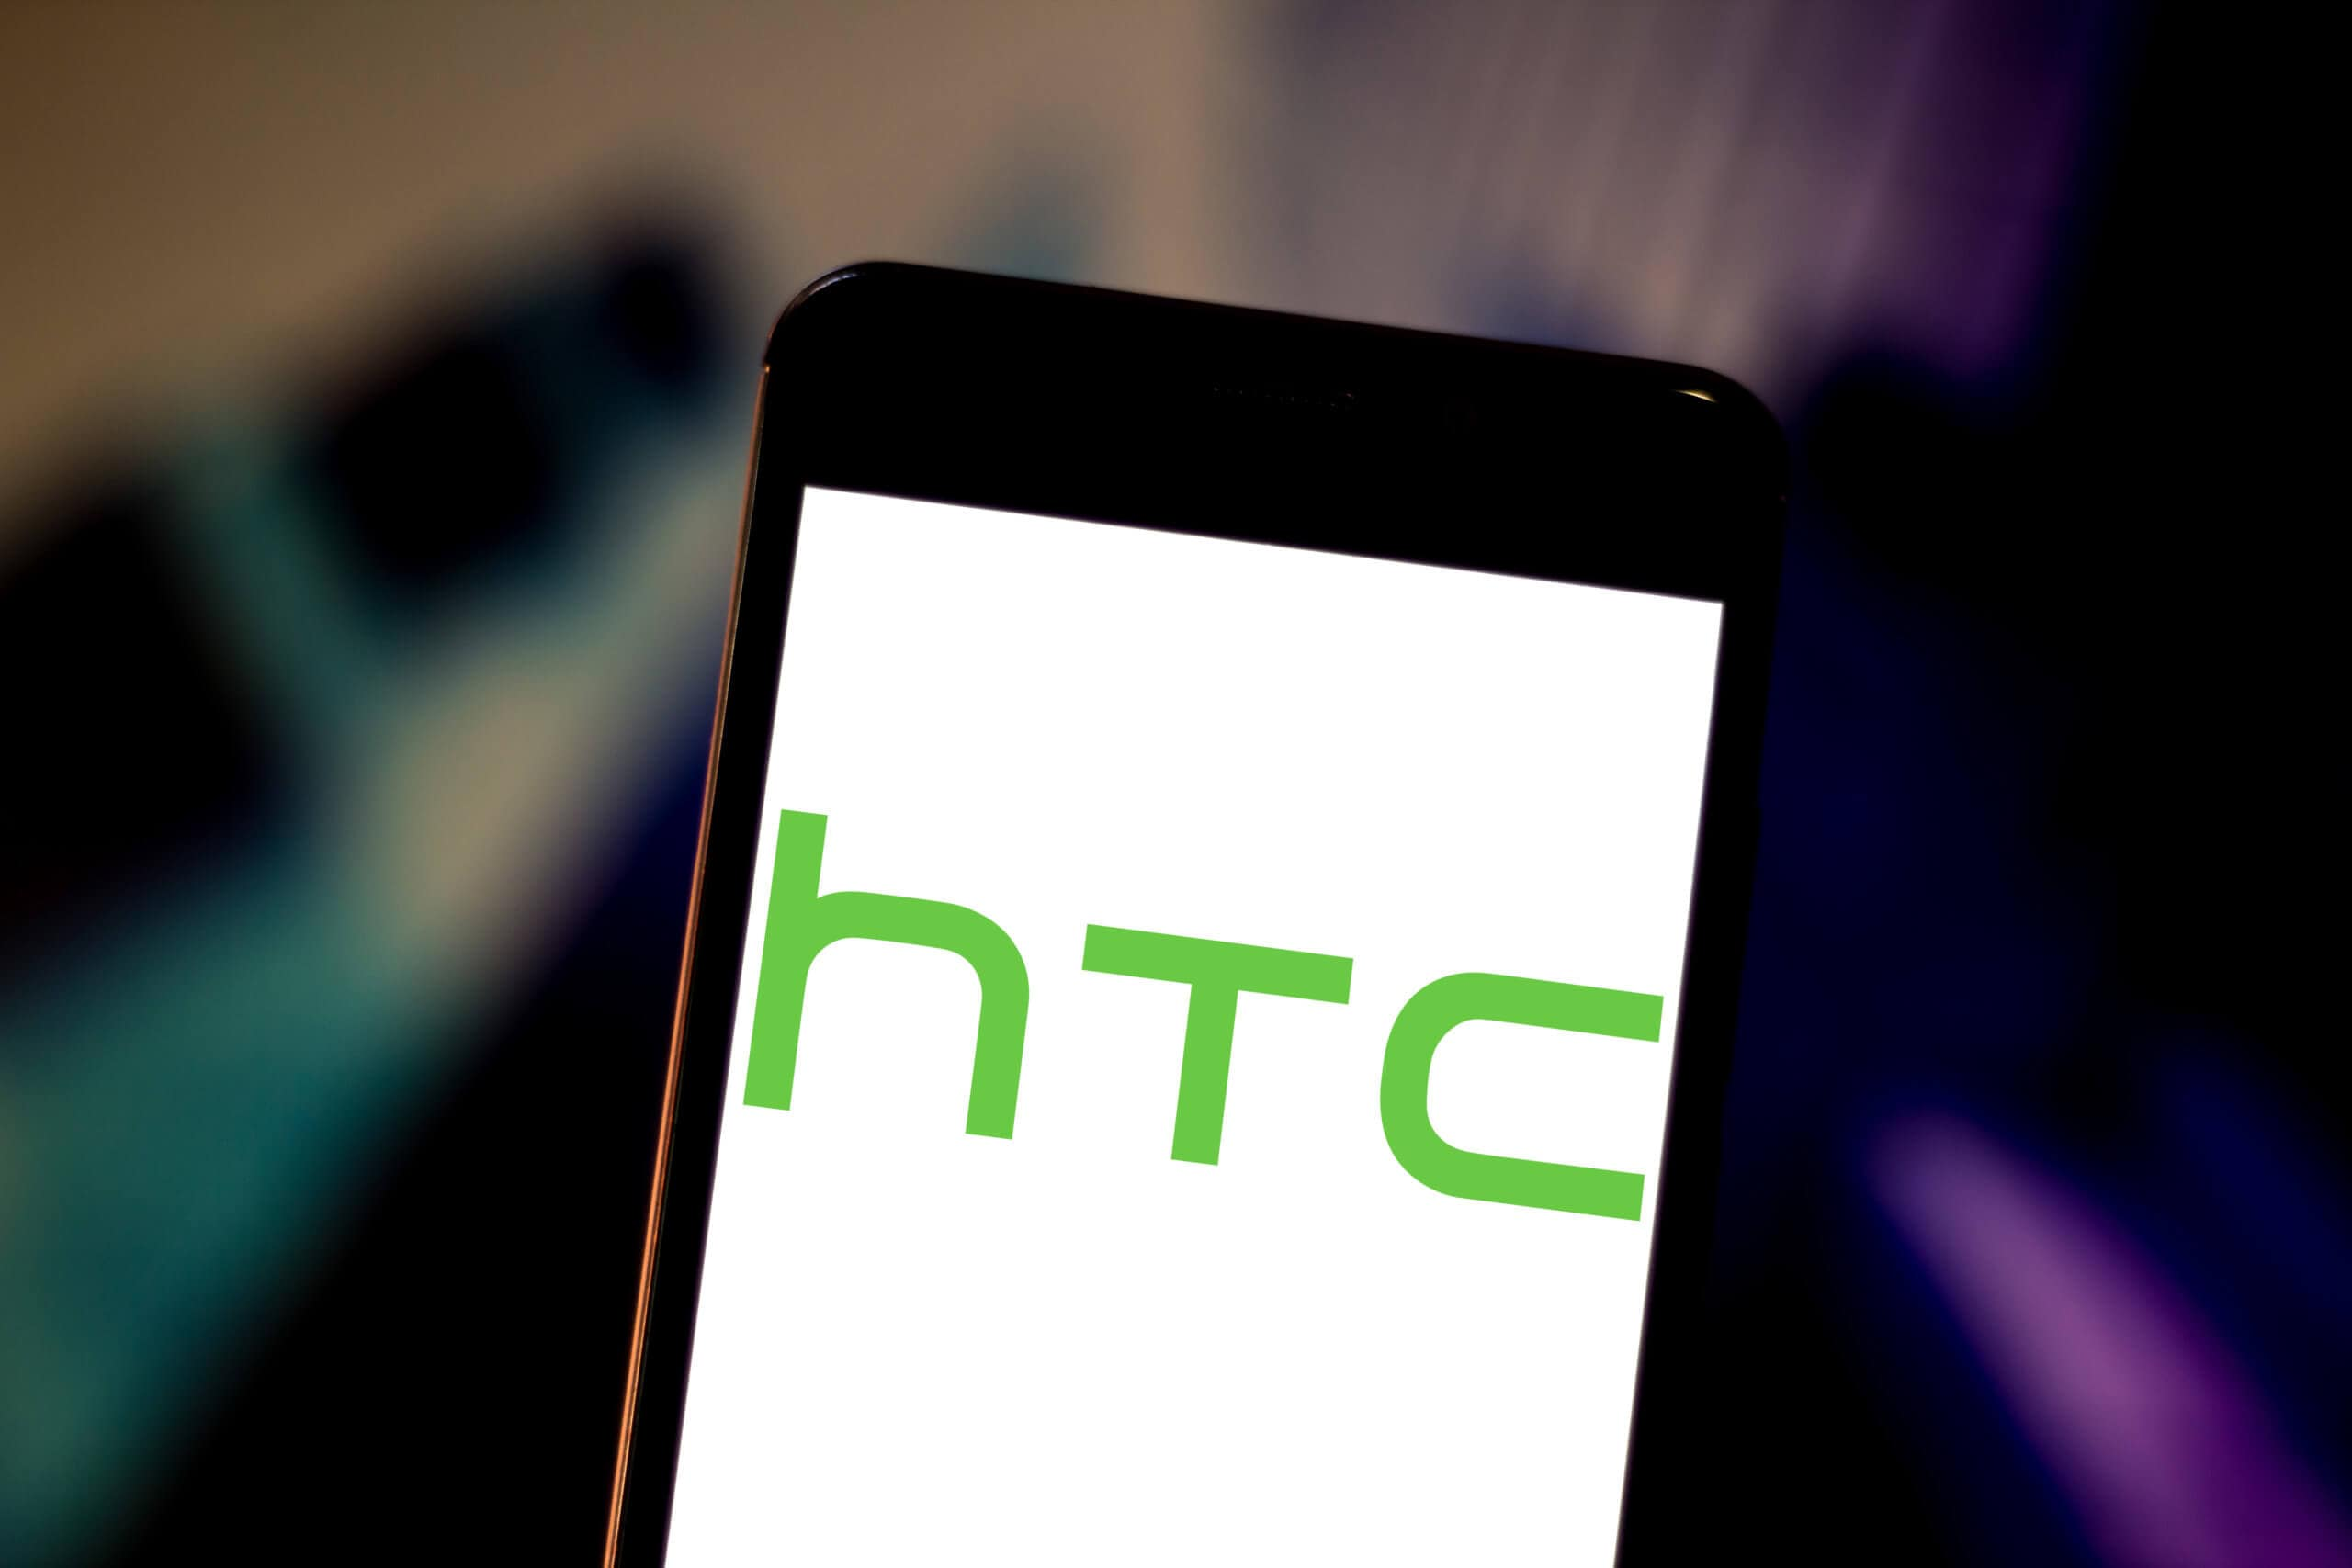 HTC Exodus Phone